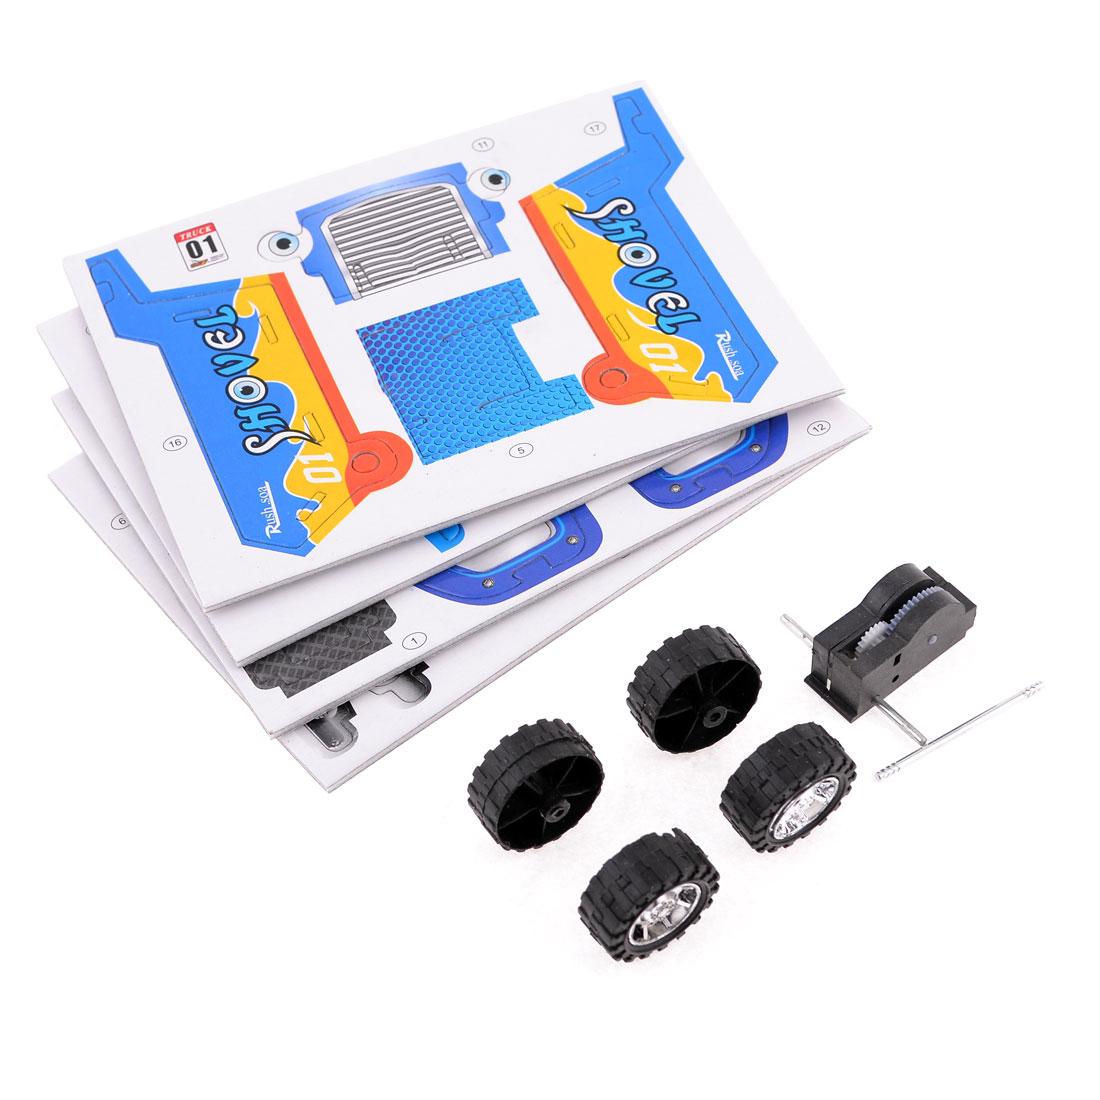 Yellow Blue Black Mini Truck Model 3D Puzzle Toy Assembling Kit for Kids